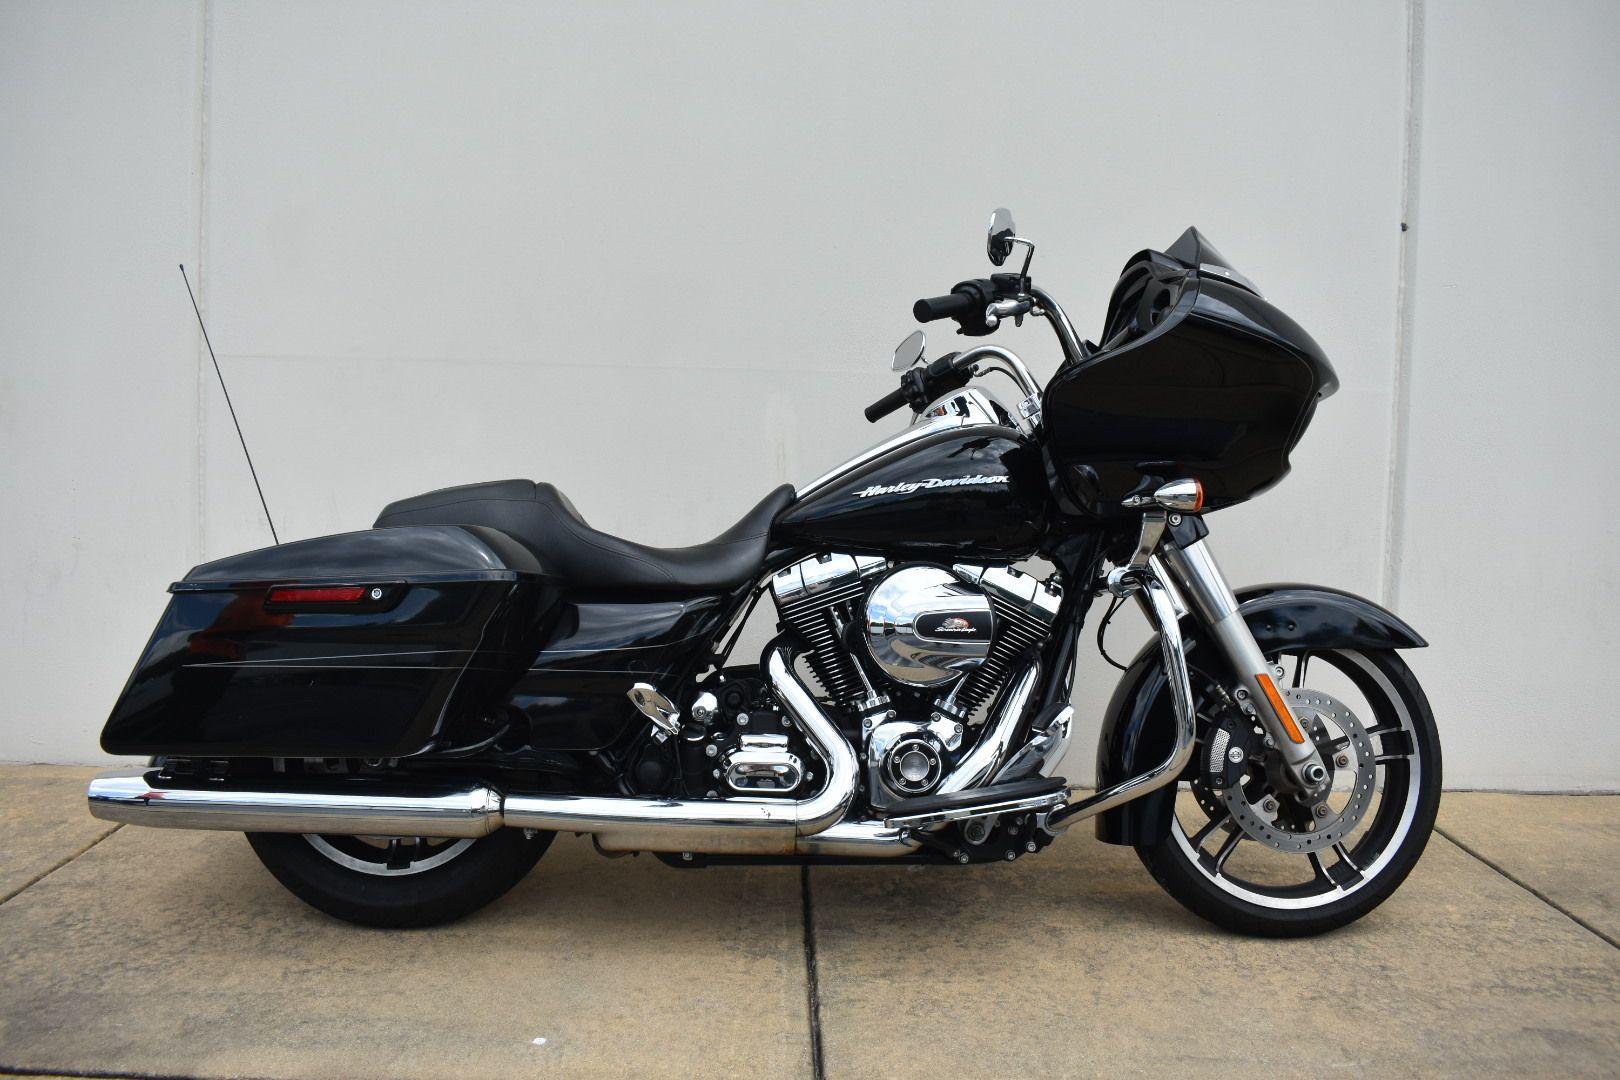 Pre-Owned 2015 Harley-Davidson Road Glide Special FLTRXS